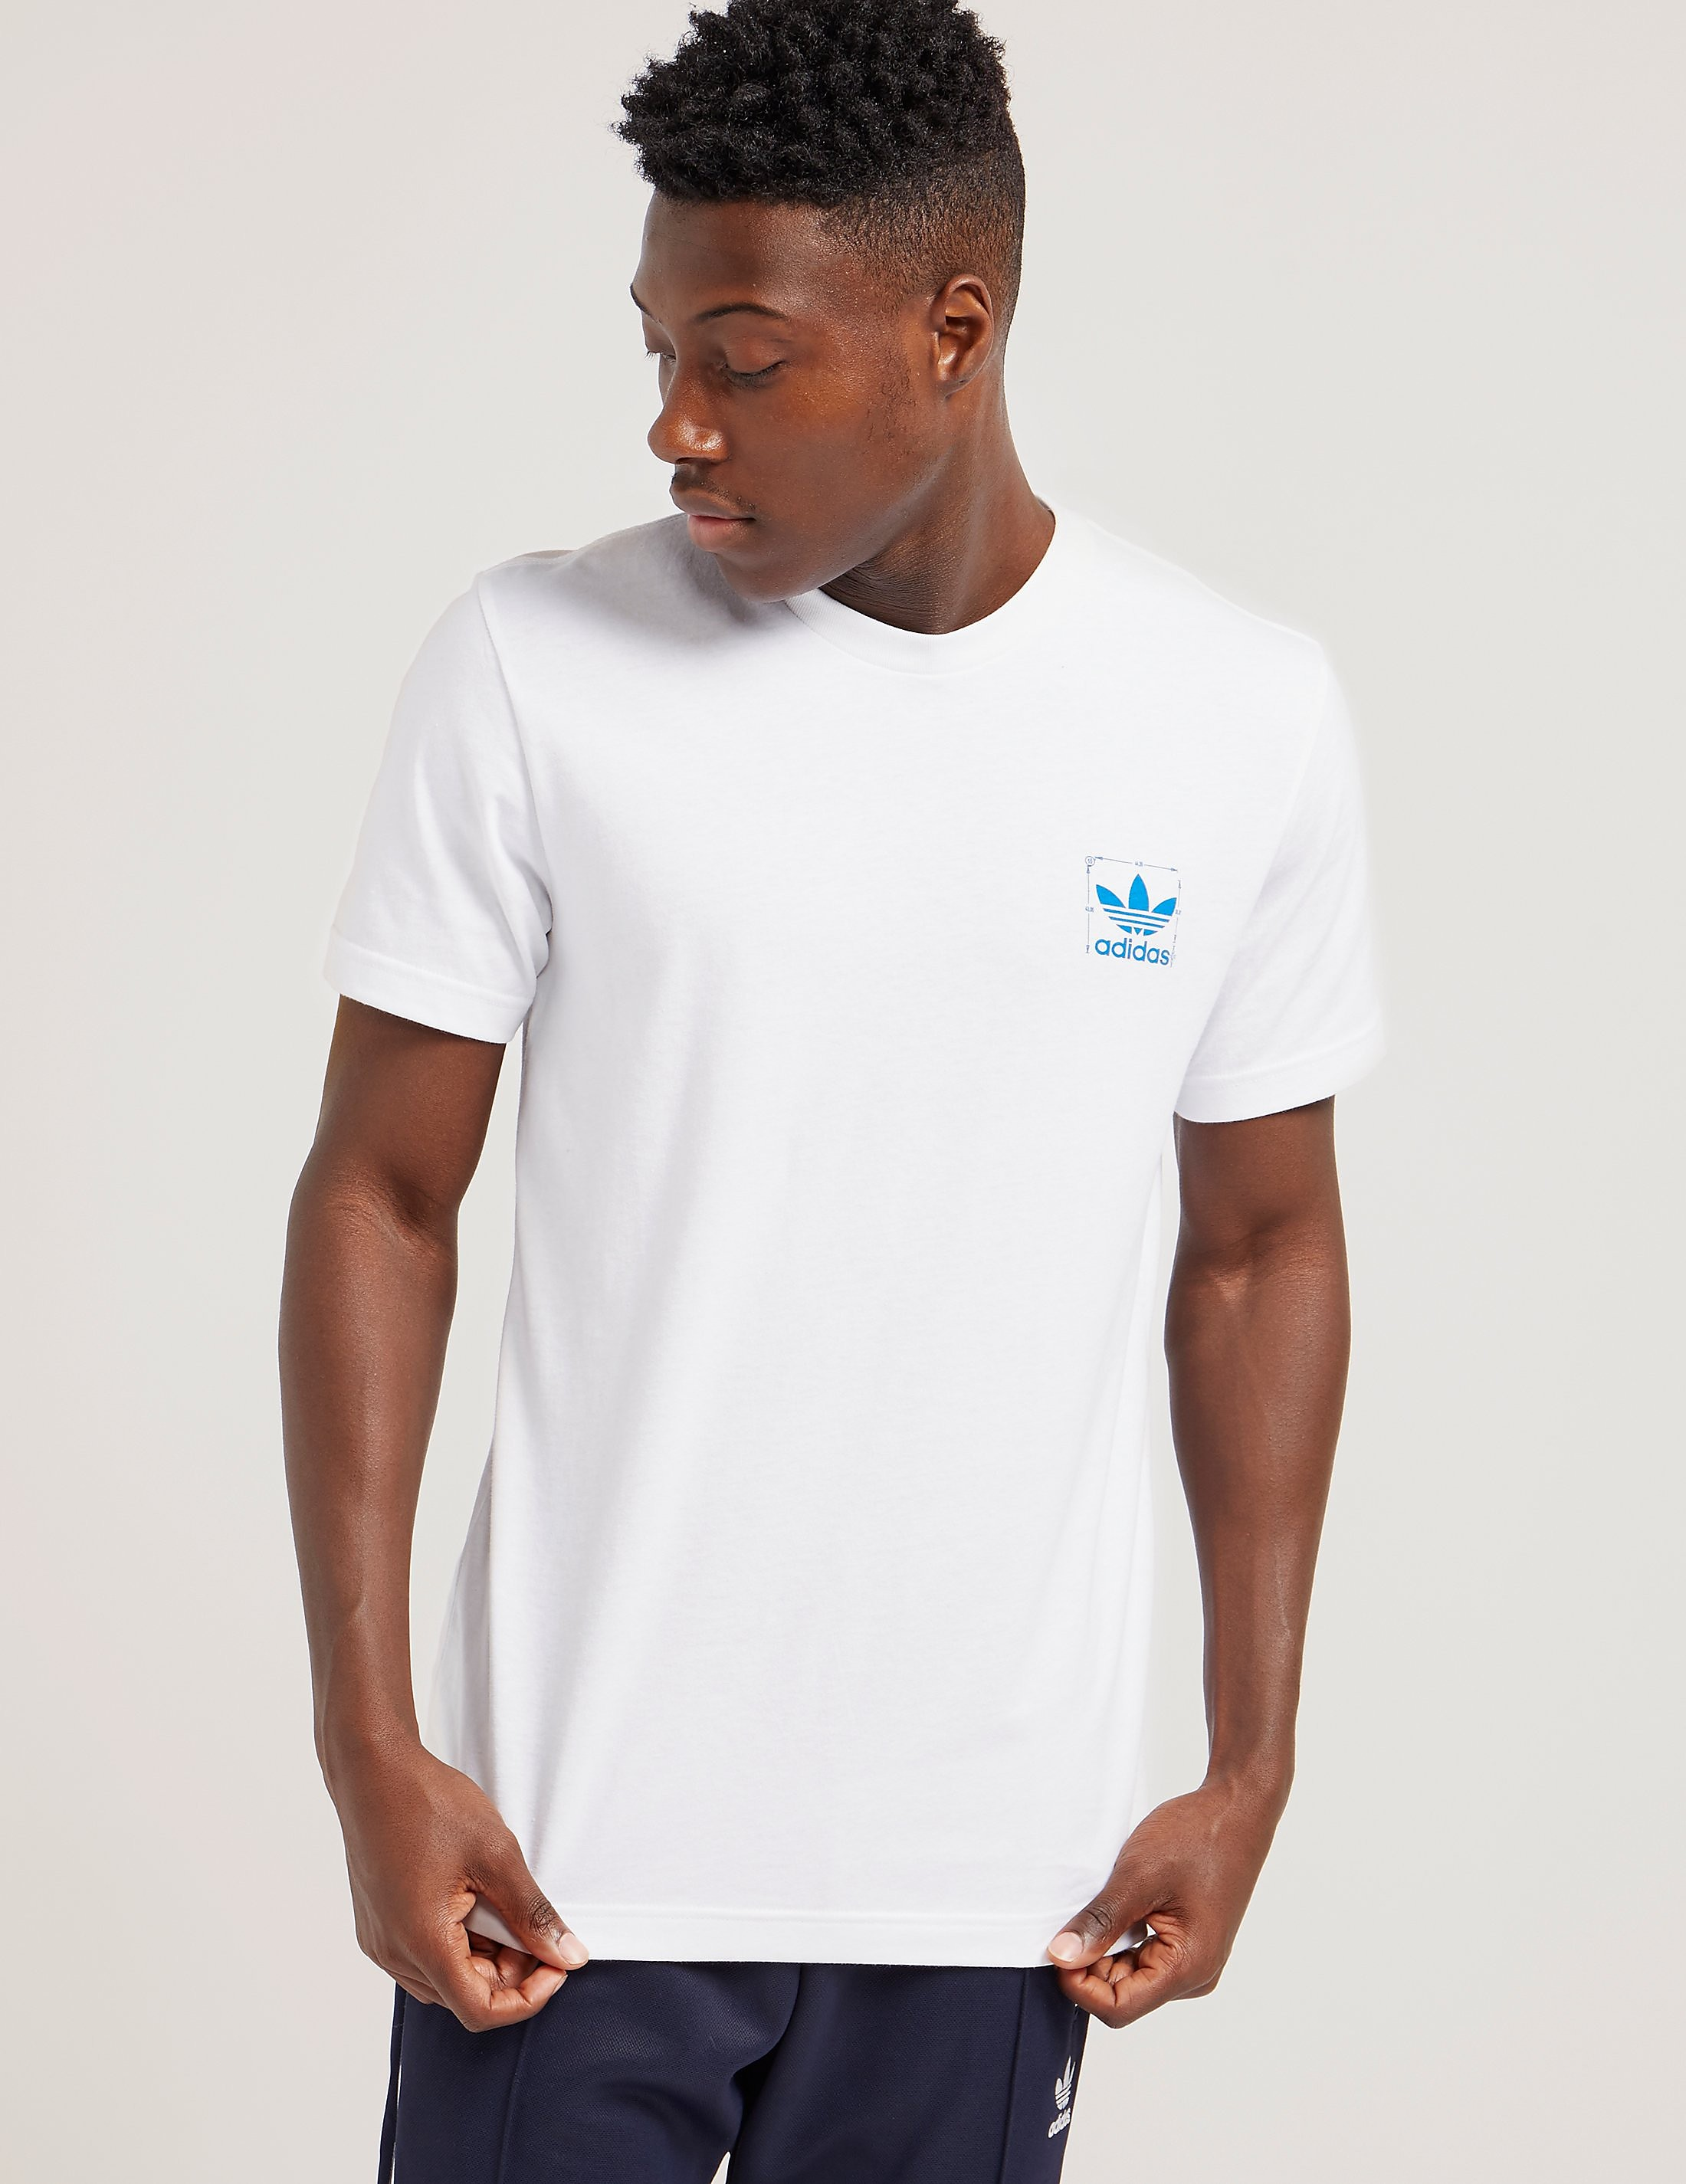 adidas Originals Scale Graphic Short Sleeve T-Shirt